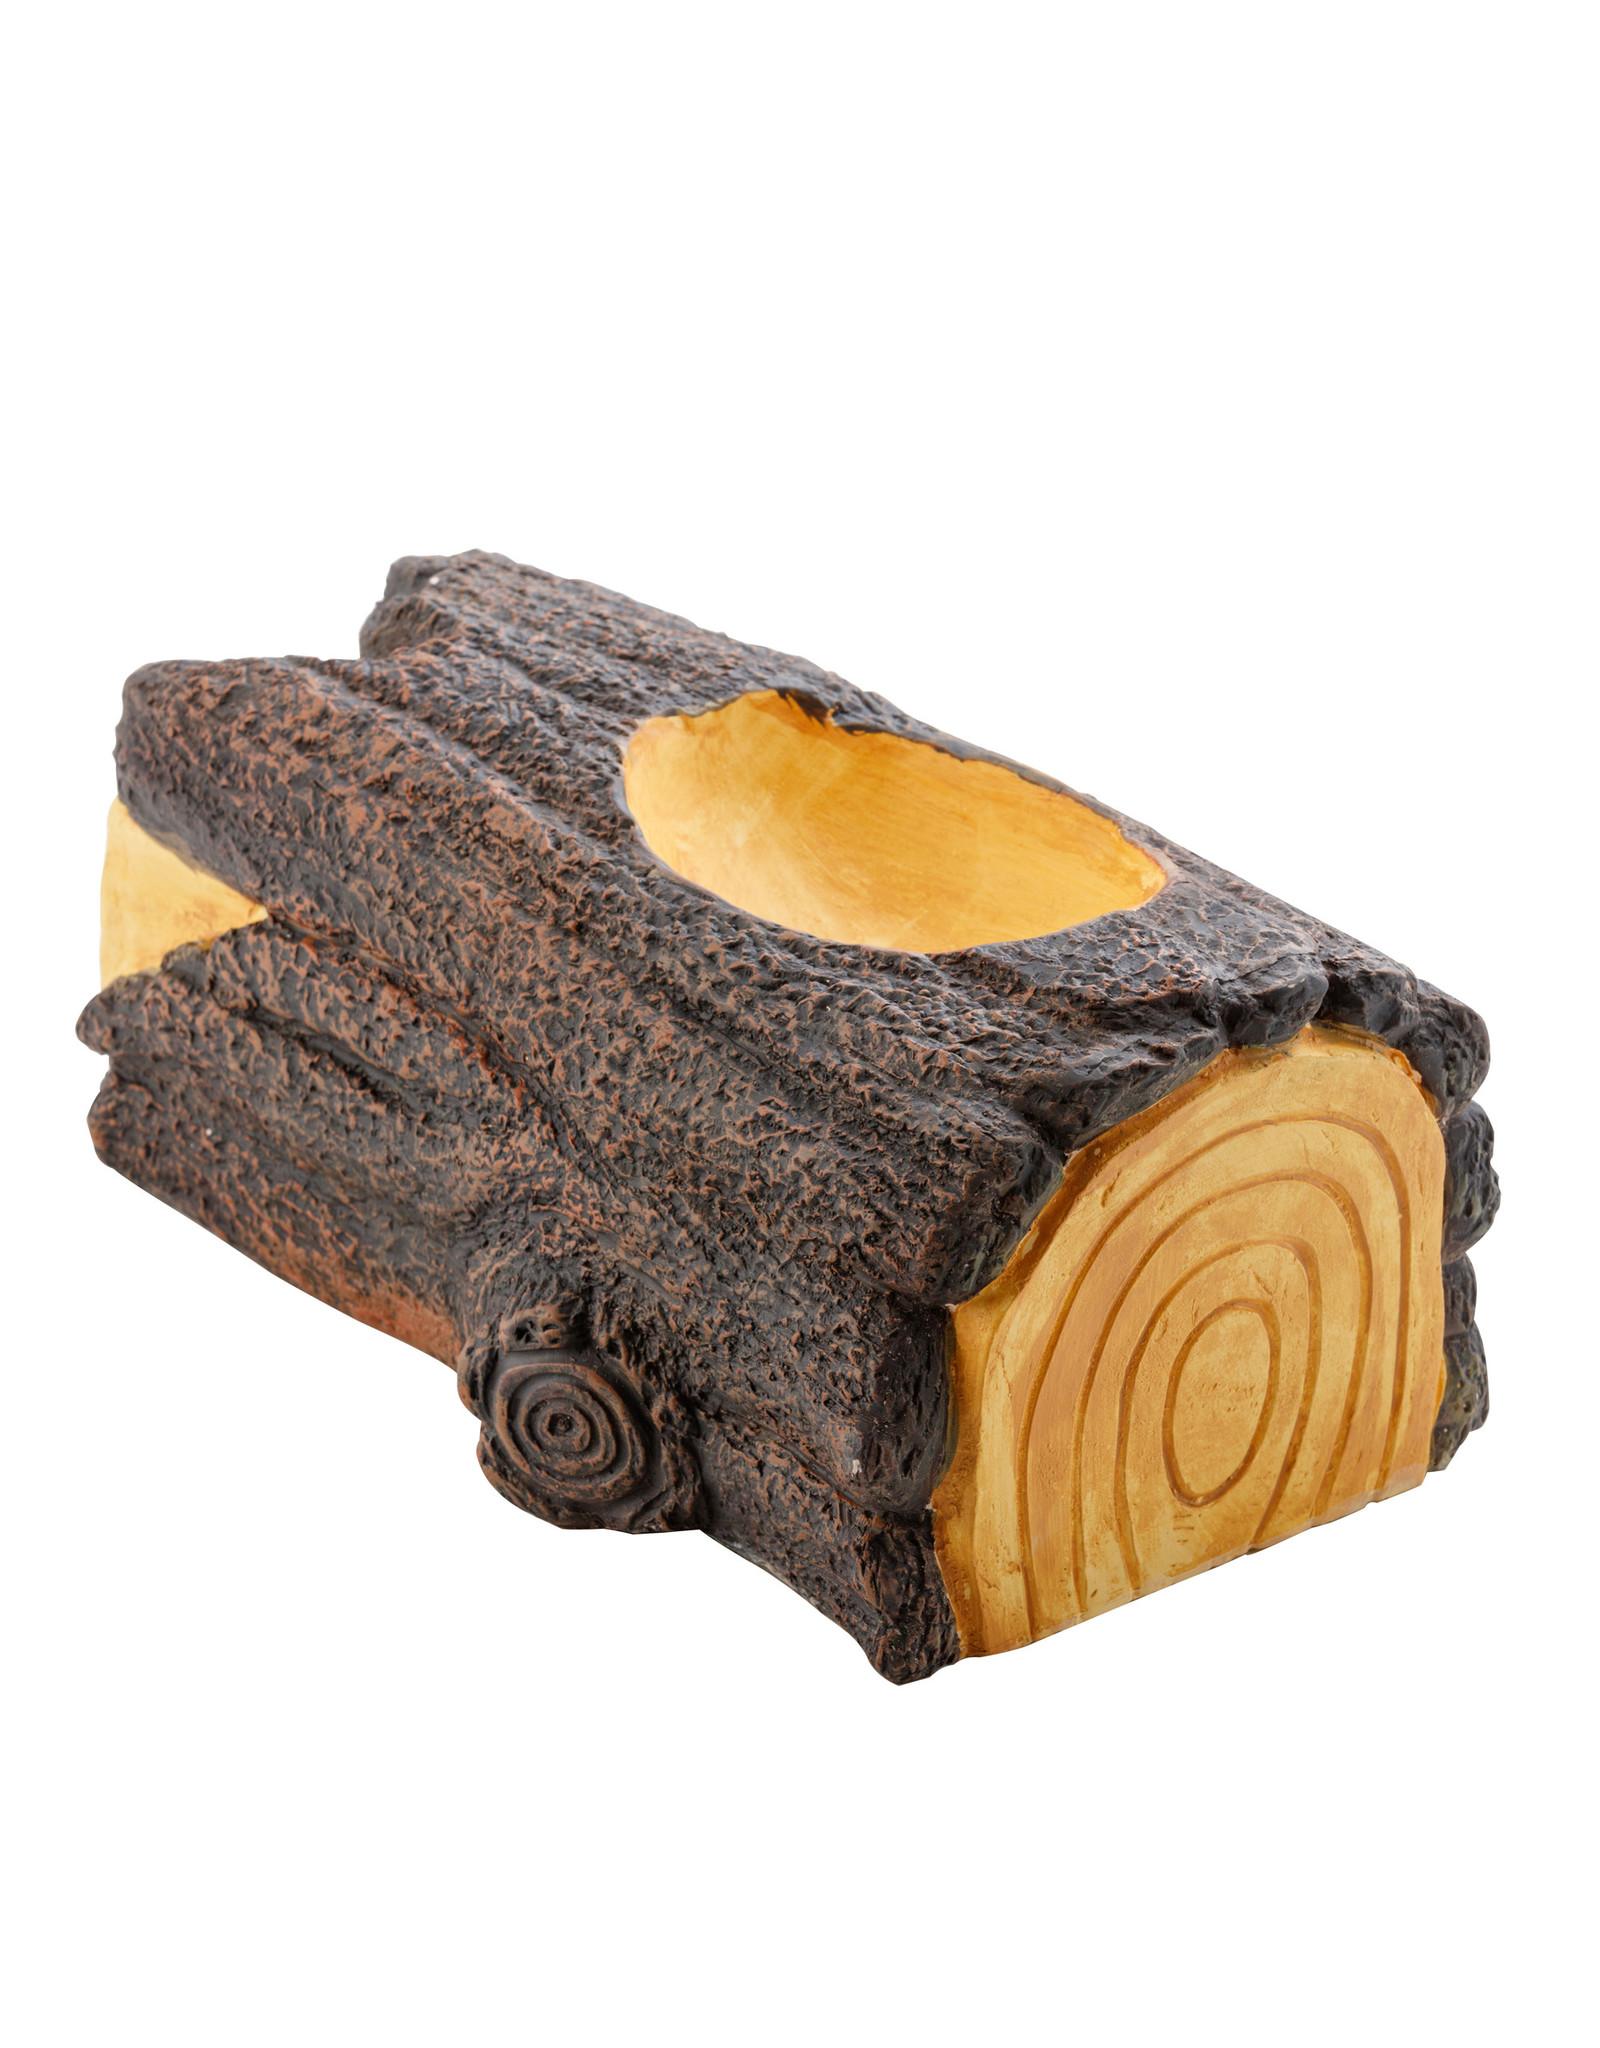 Exo Terra Exo Terra Wet Log - Large